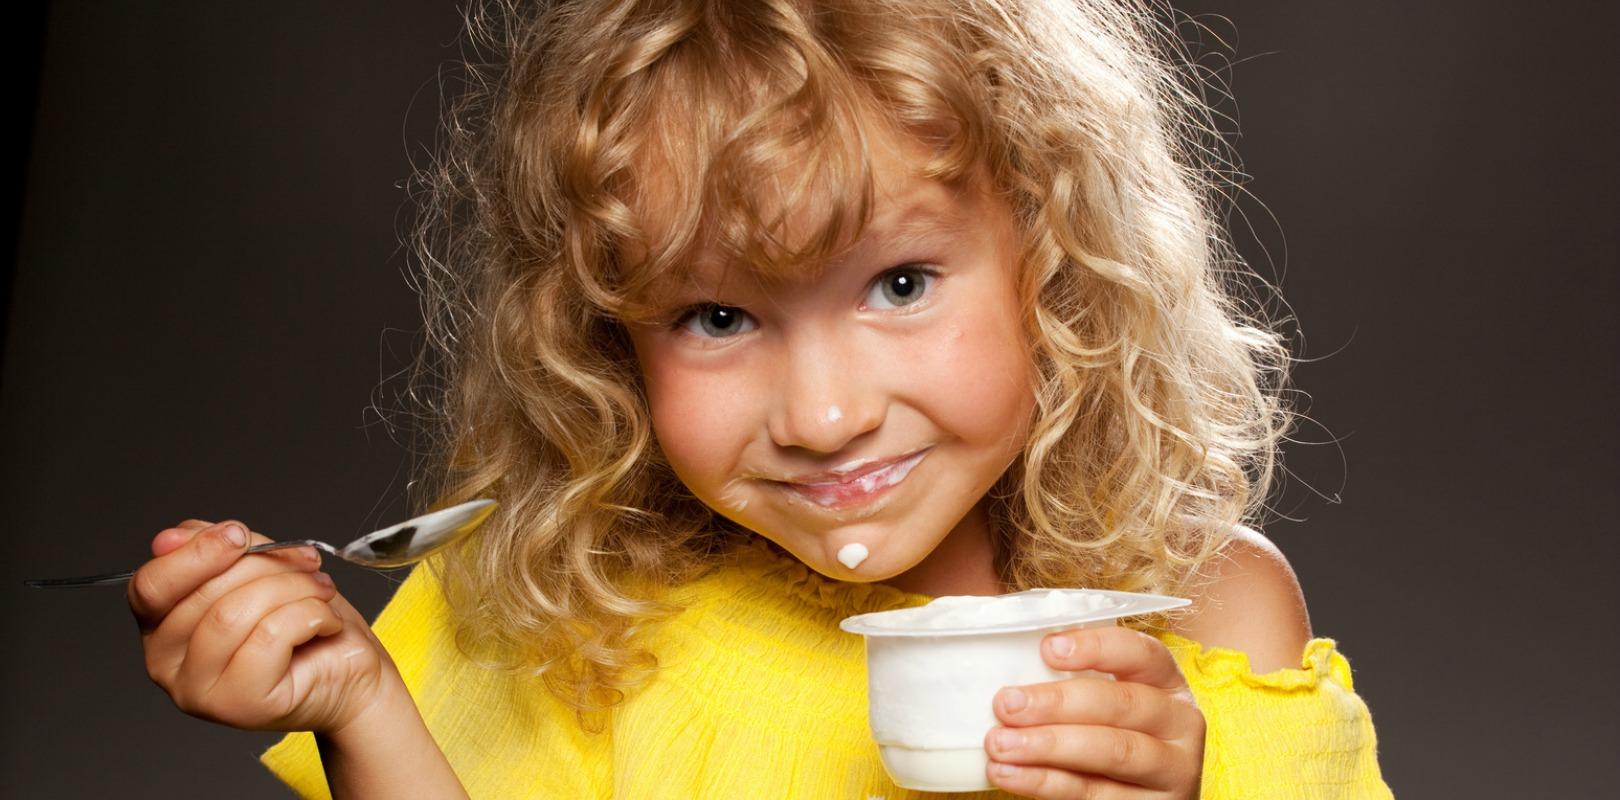 Impact of yogurt on cardiovascular risk in children